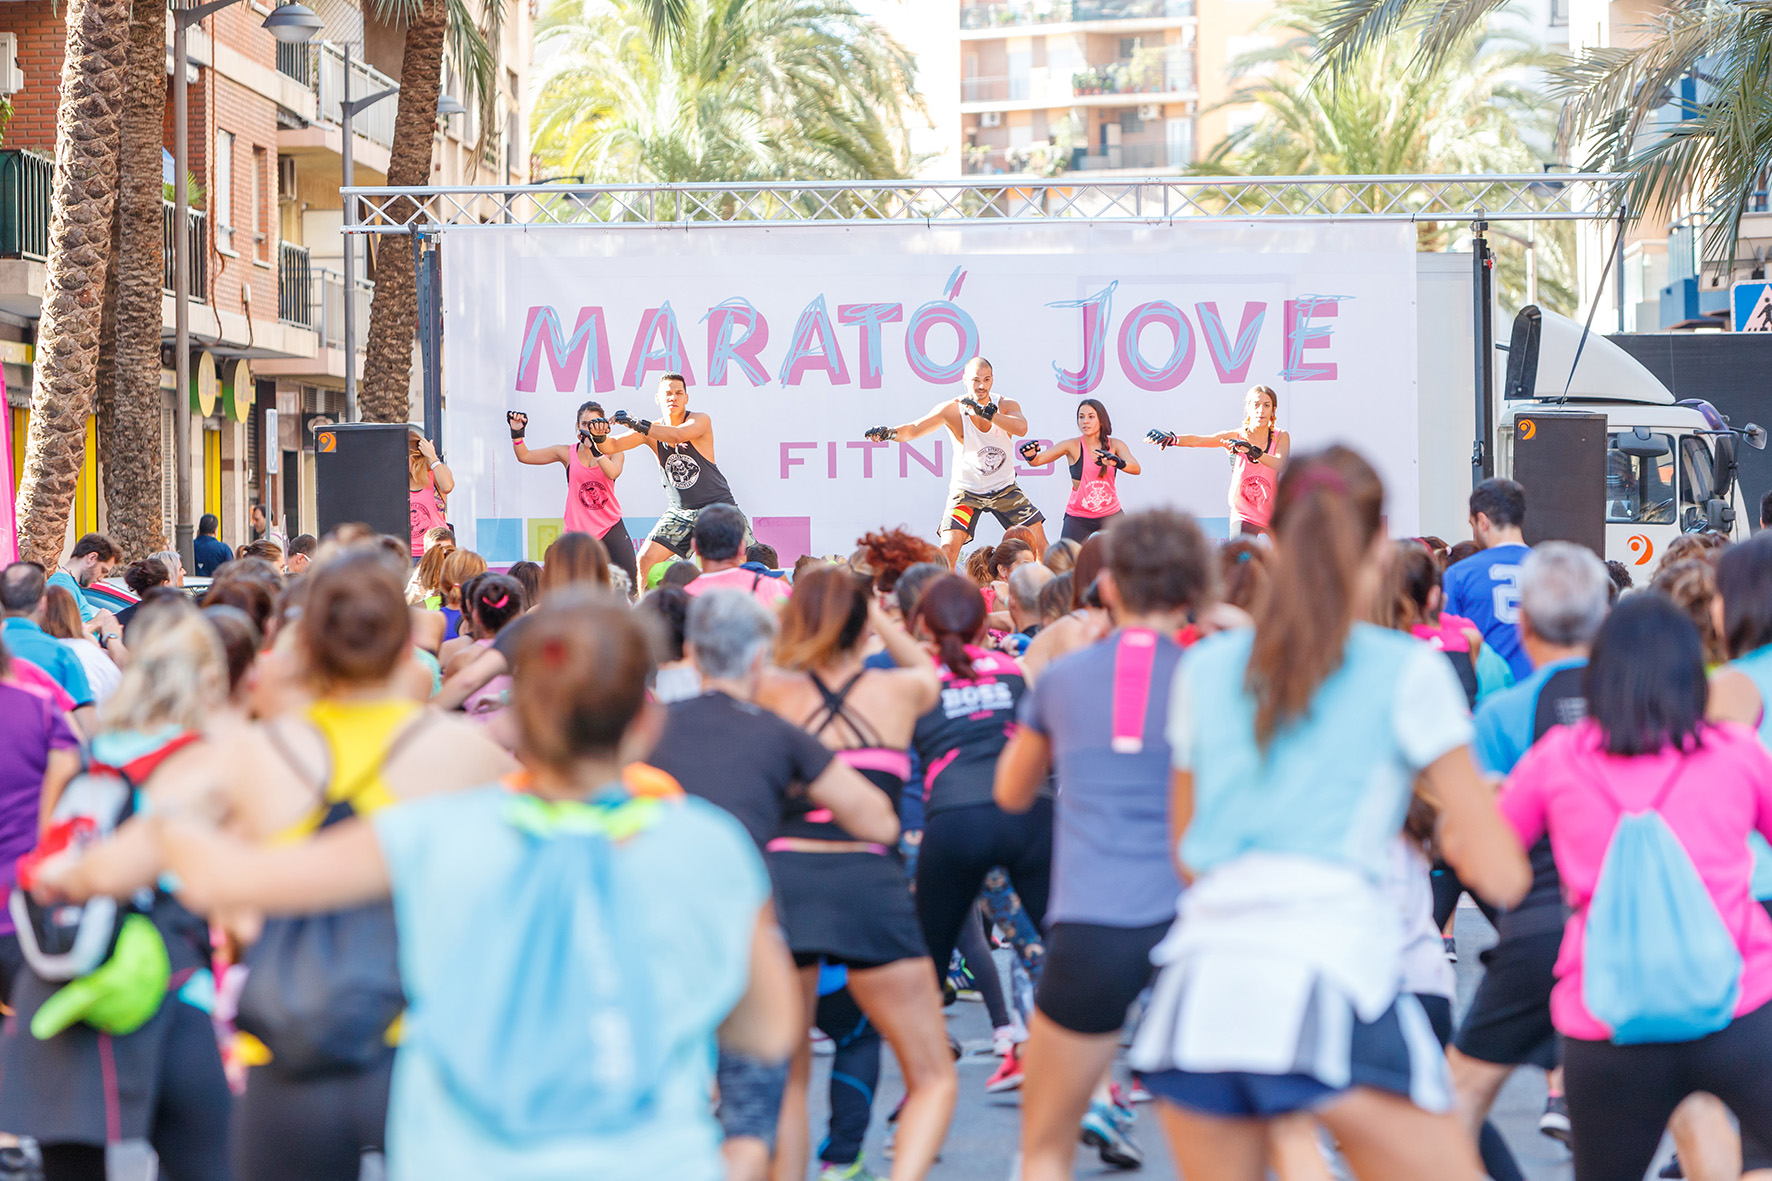 marato-jove-de-fitness-2017-3